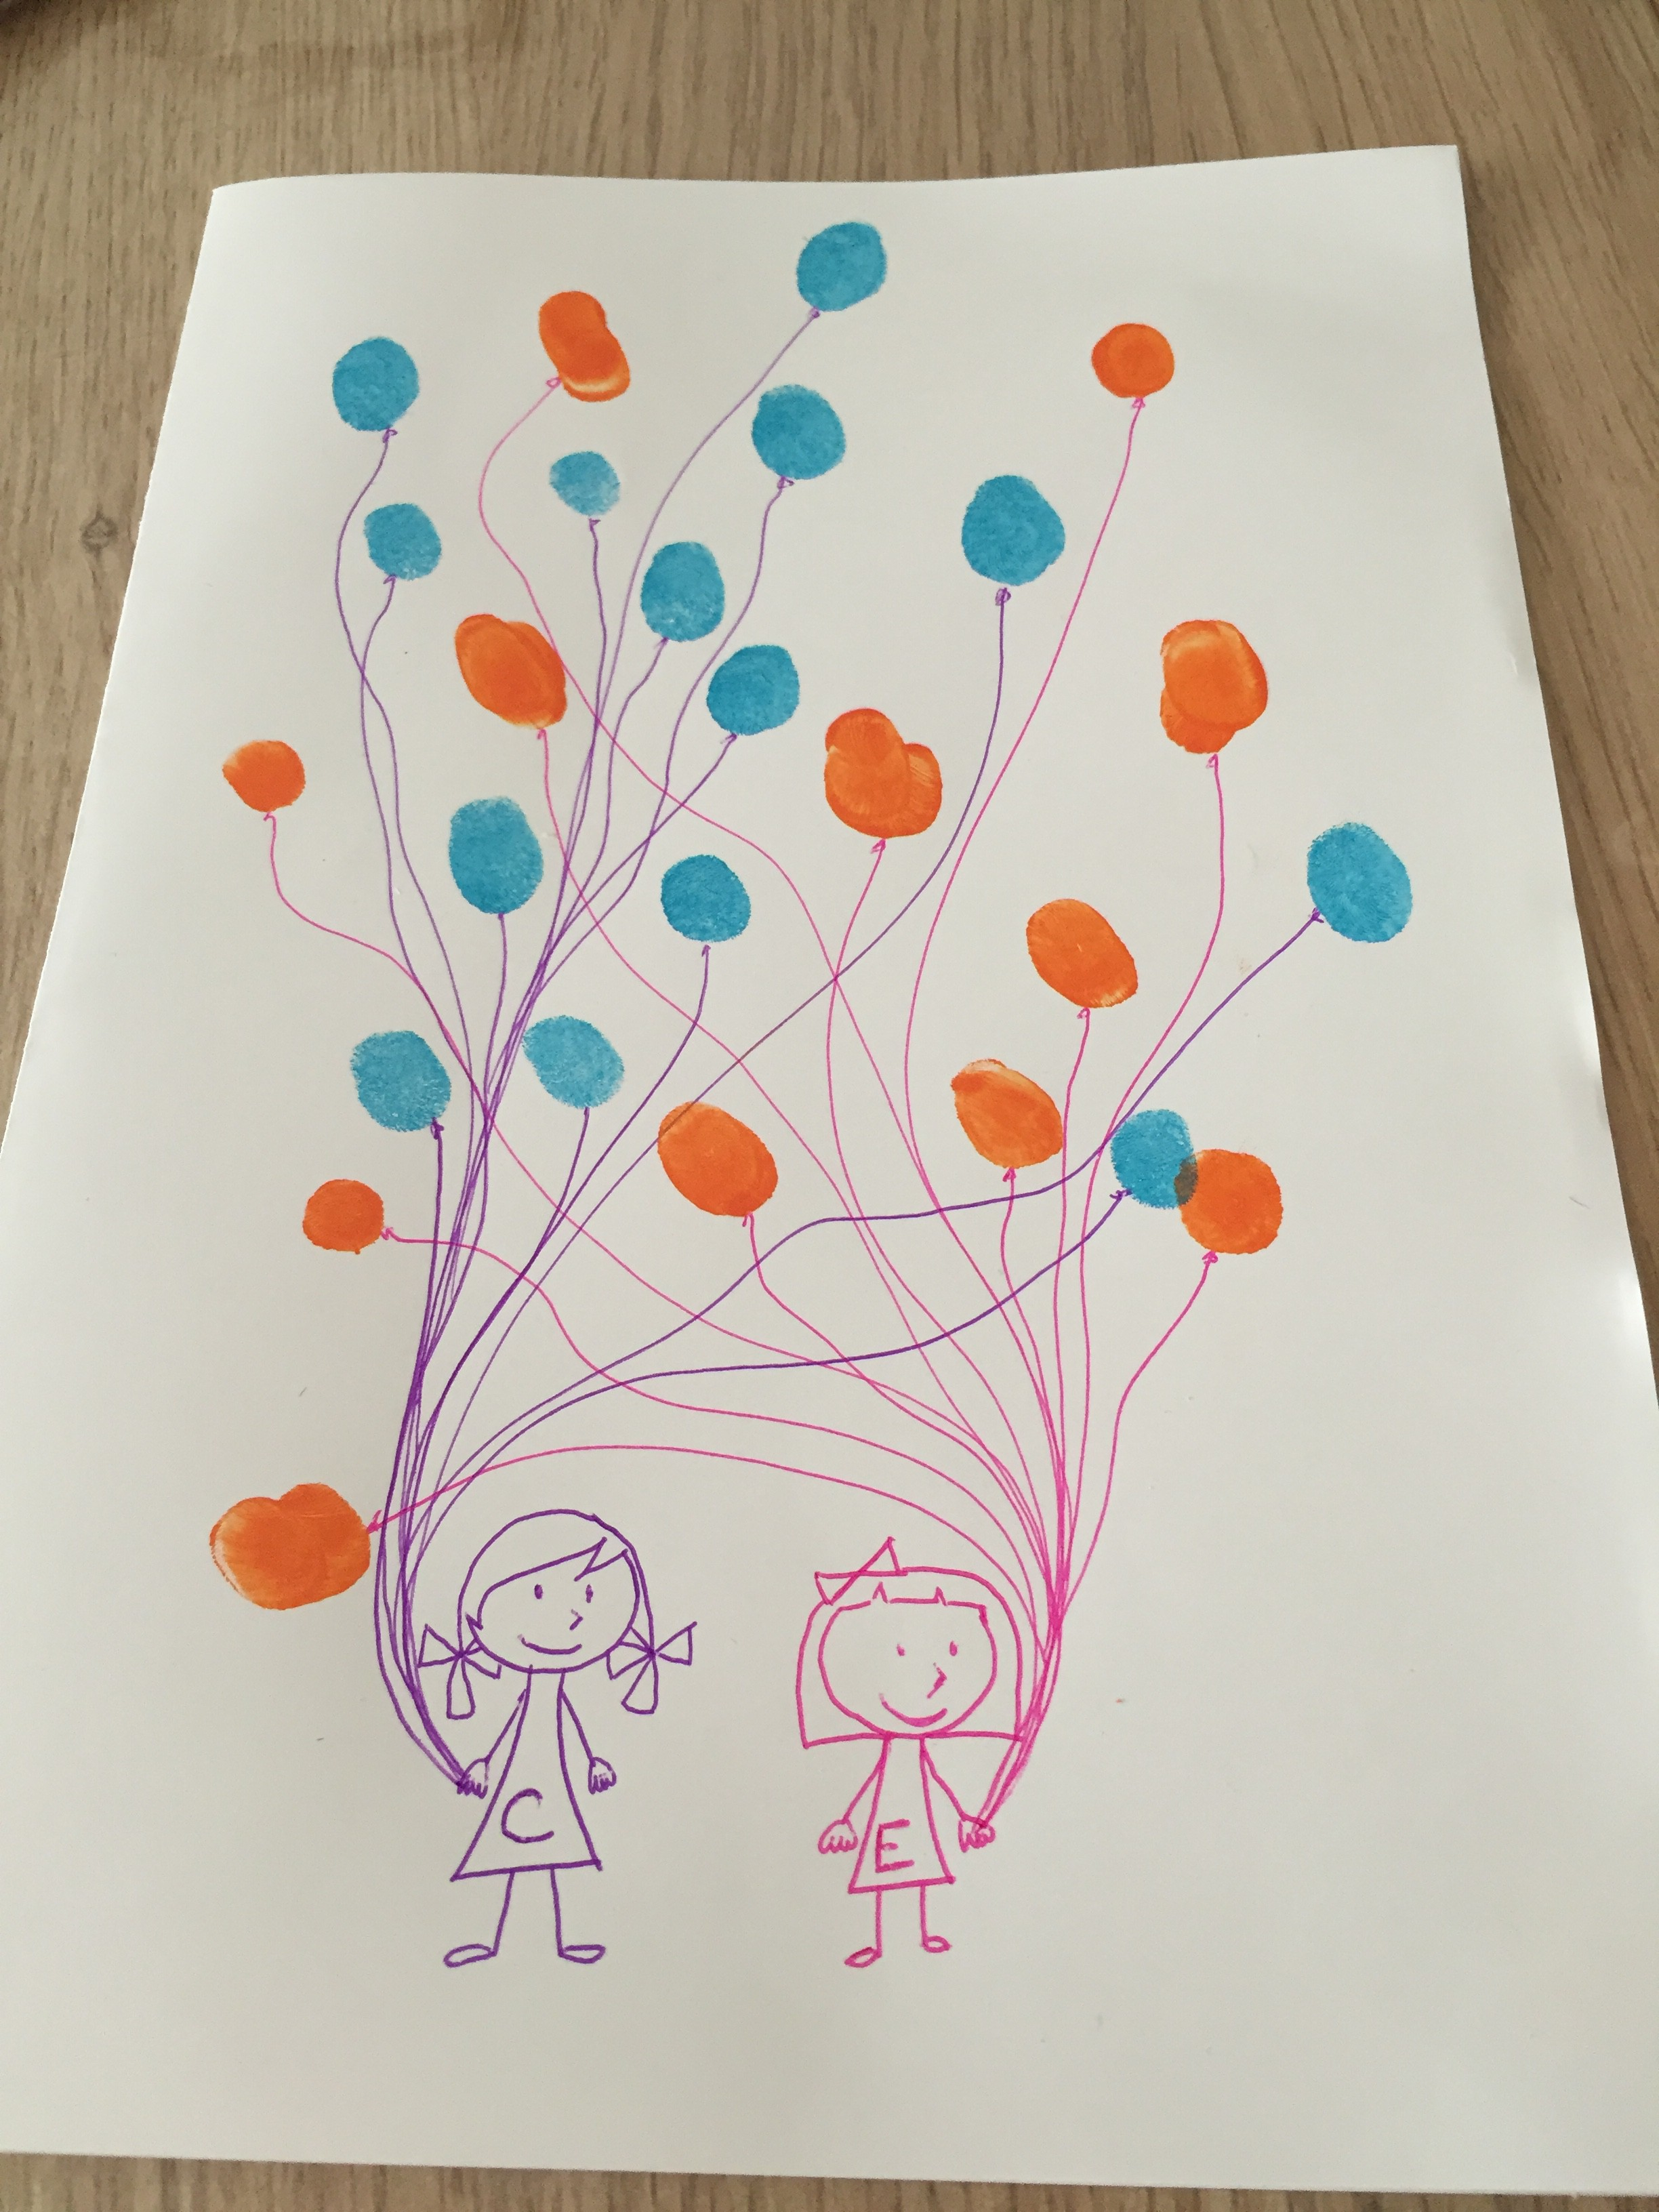 [DIY] Ballons avec les empreintes